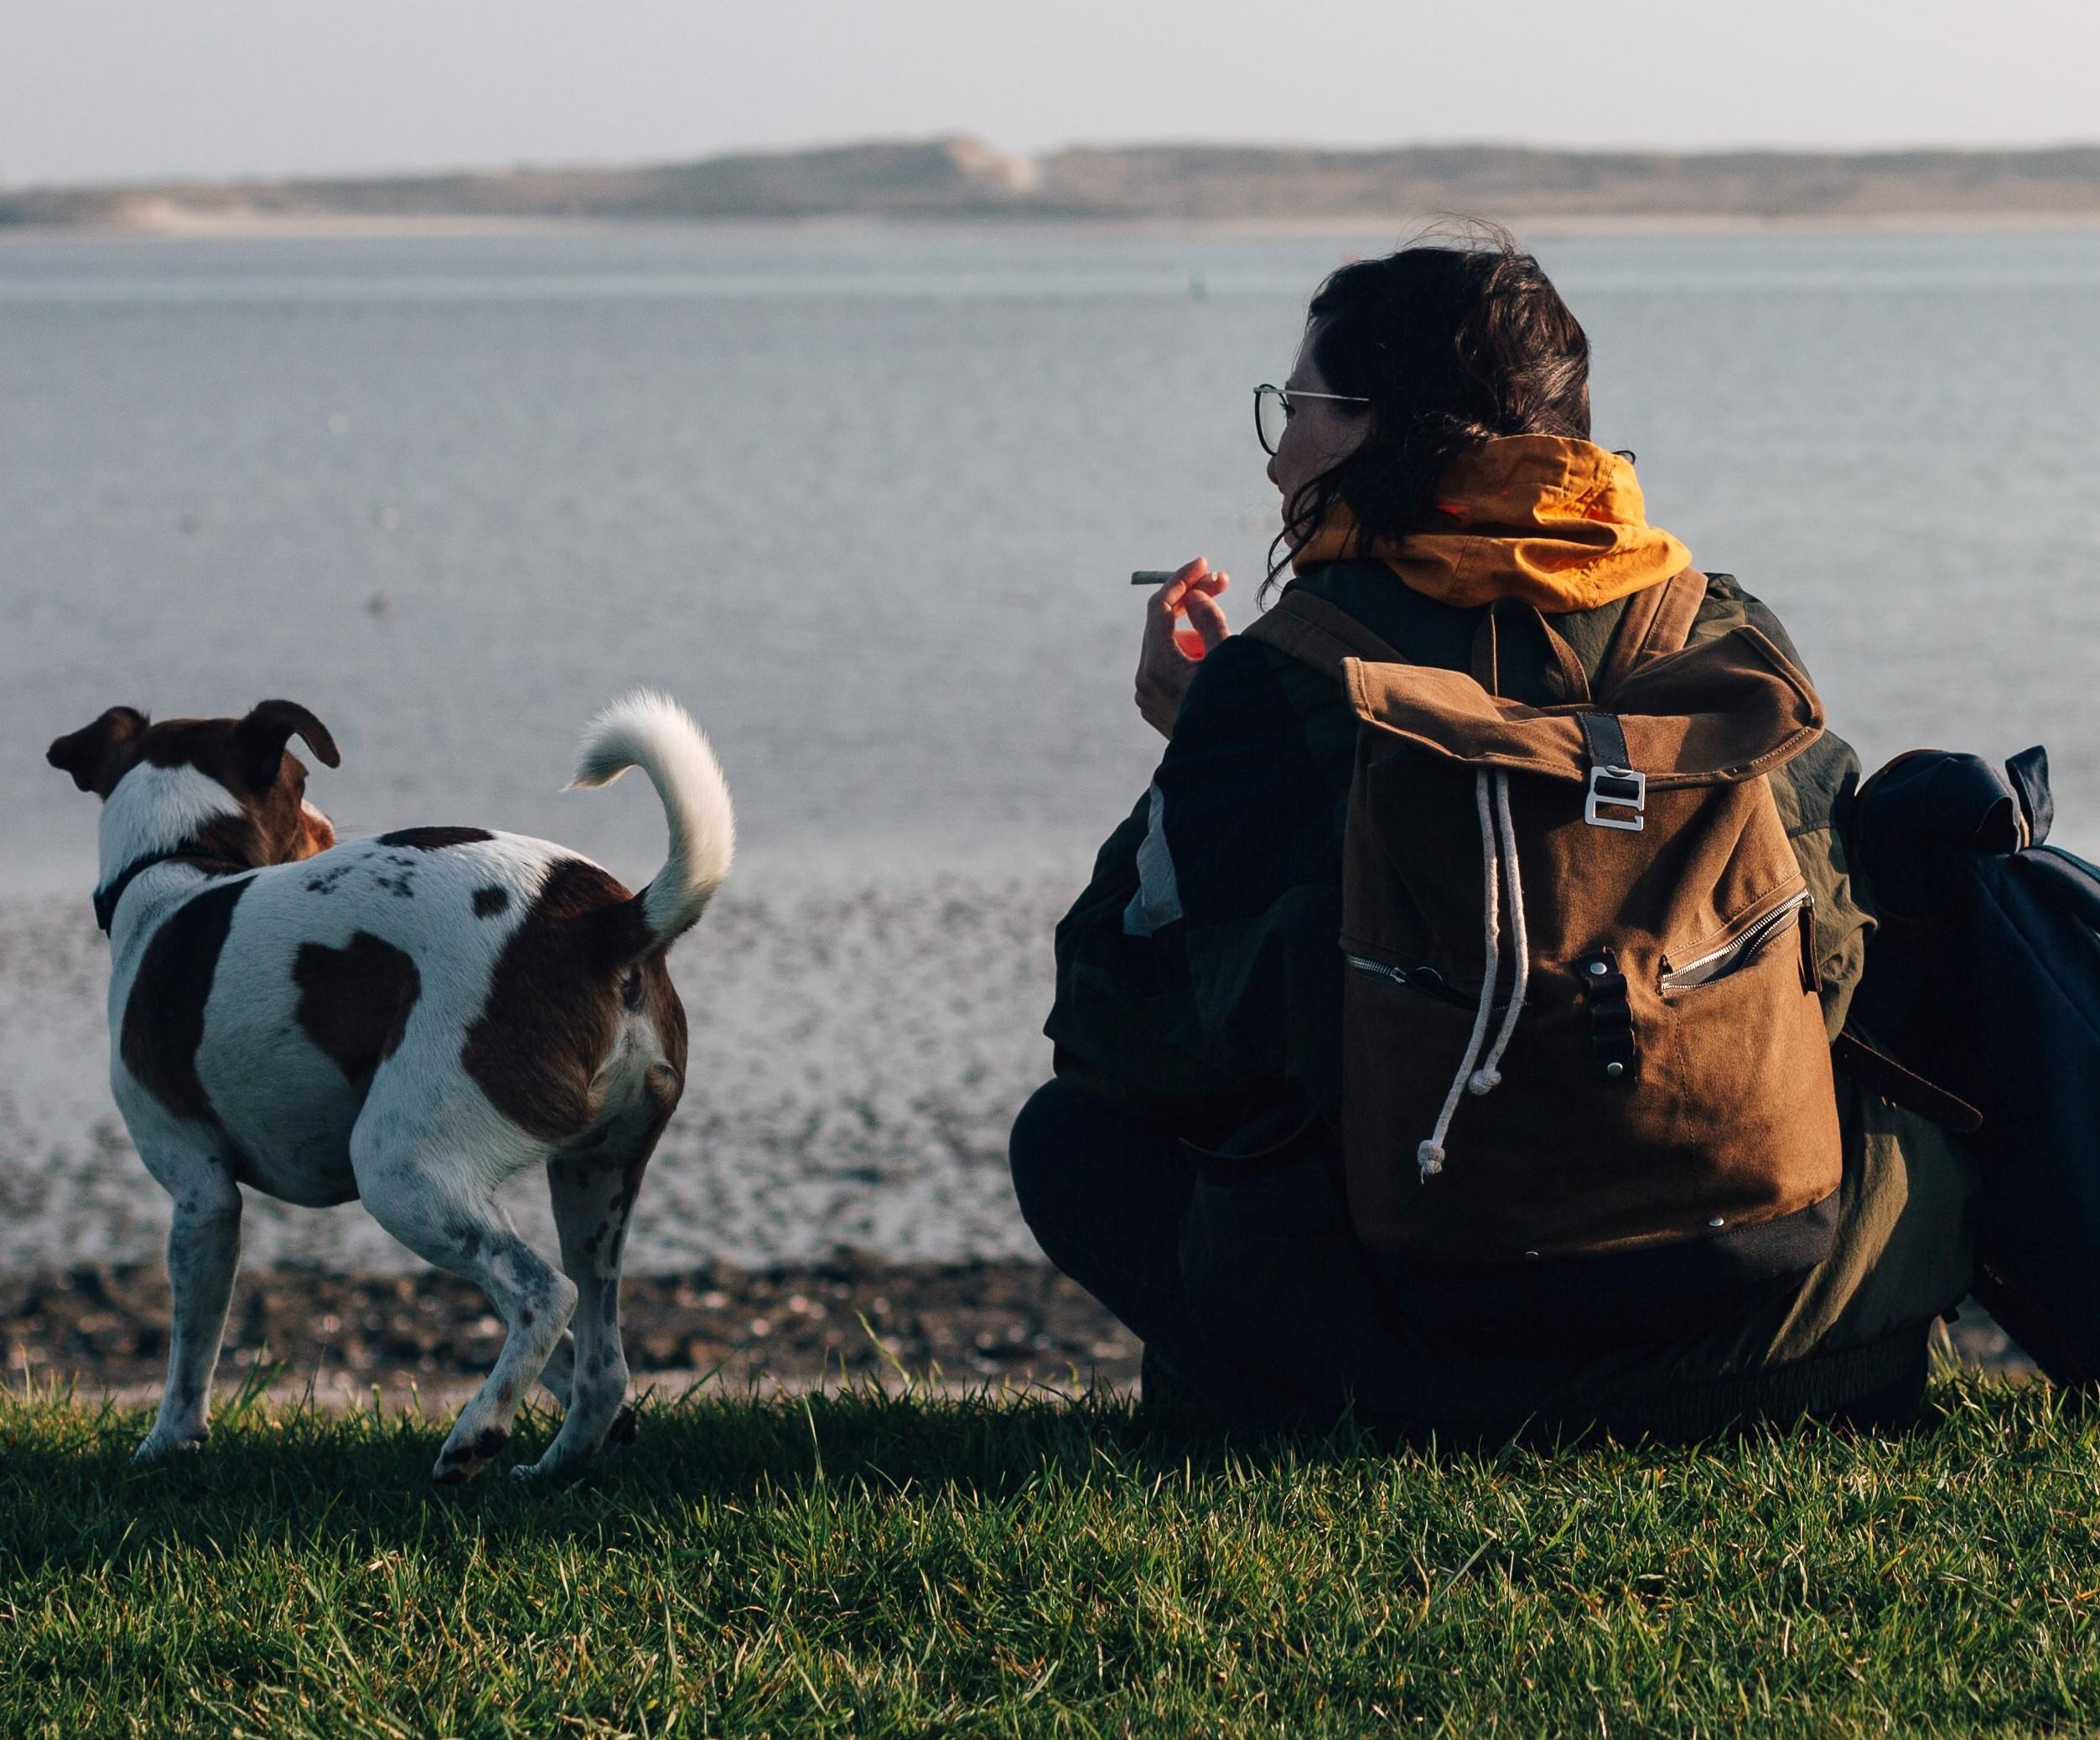 Woman on beach smoking by dog